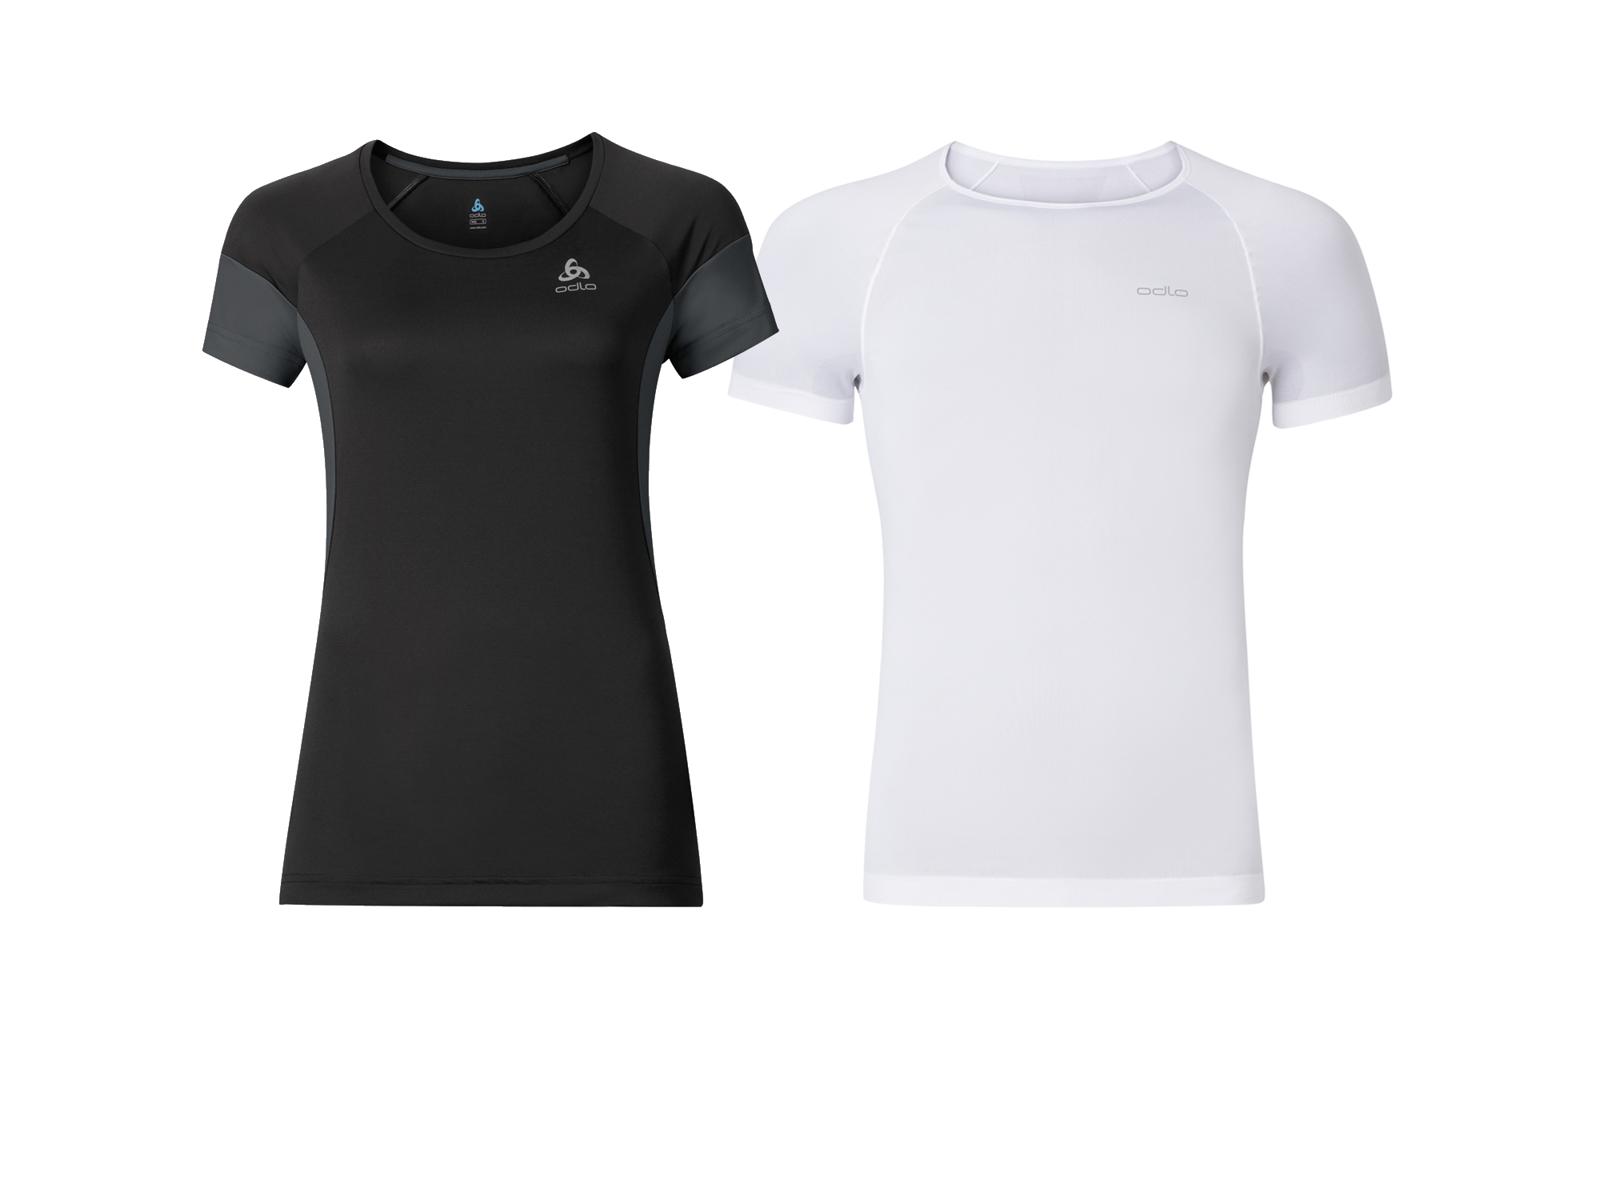 T-shirts / singletter